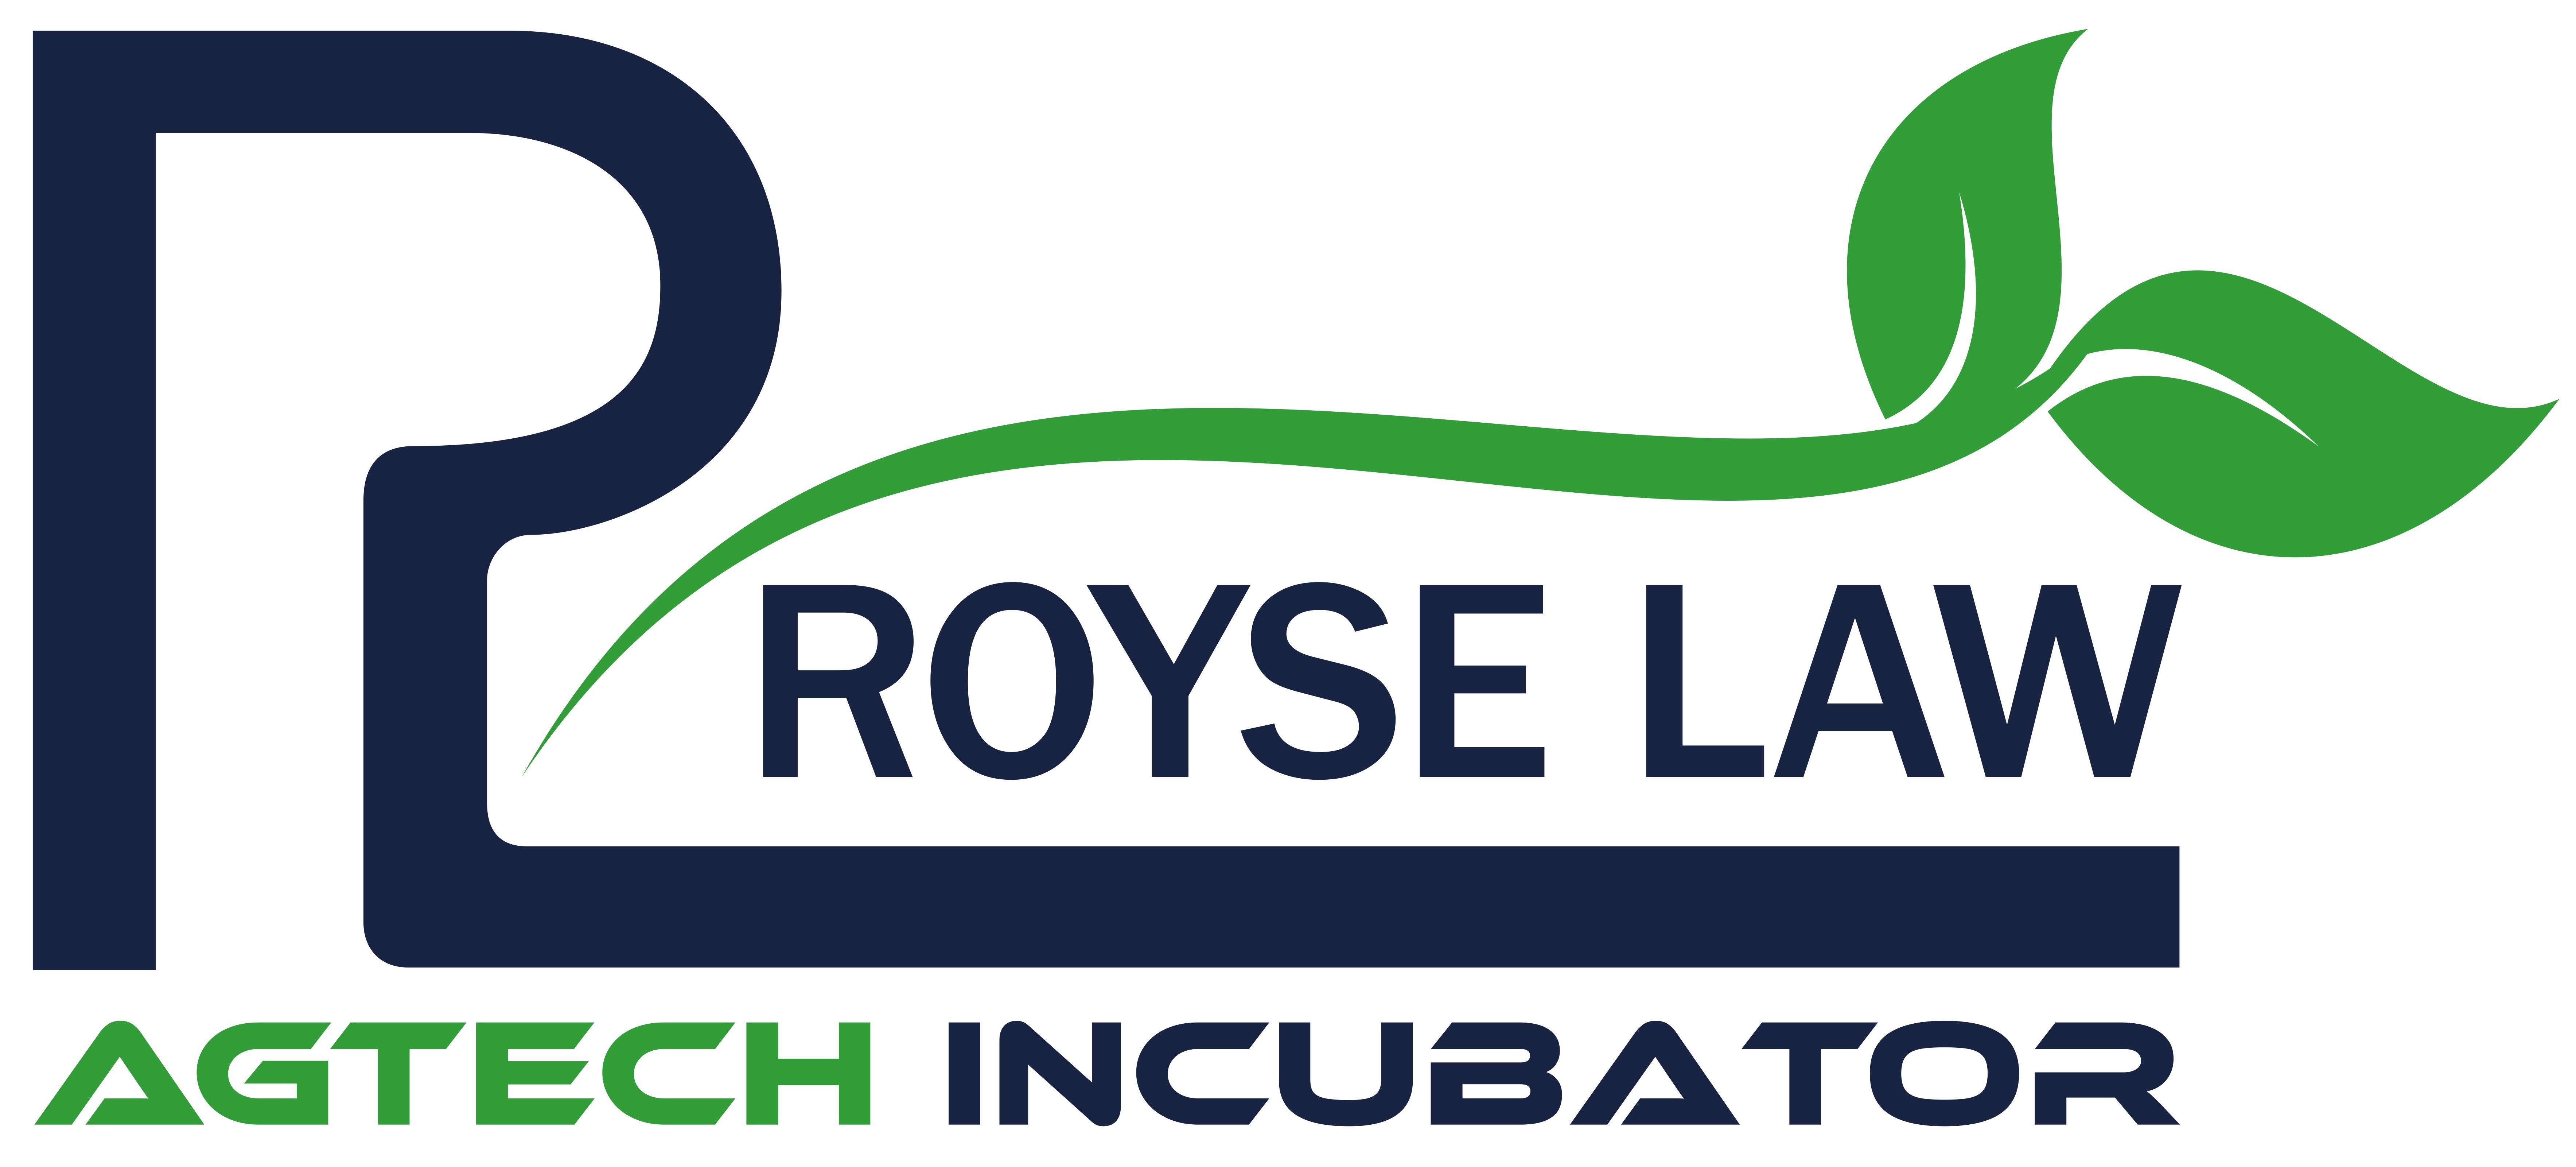 RoyseLaw AgTech Incubator